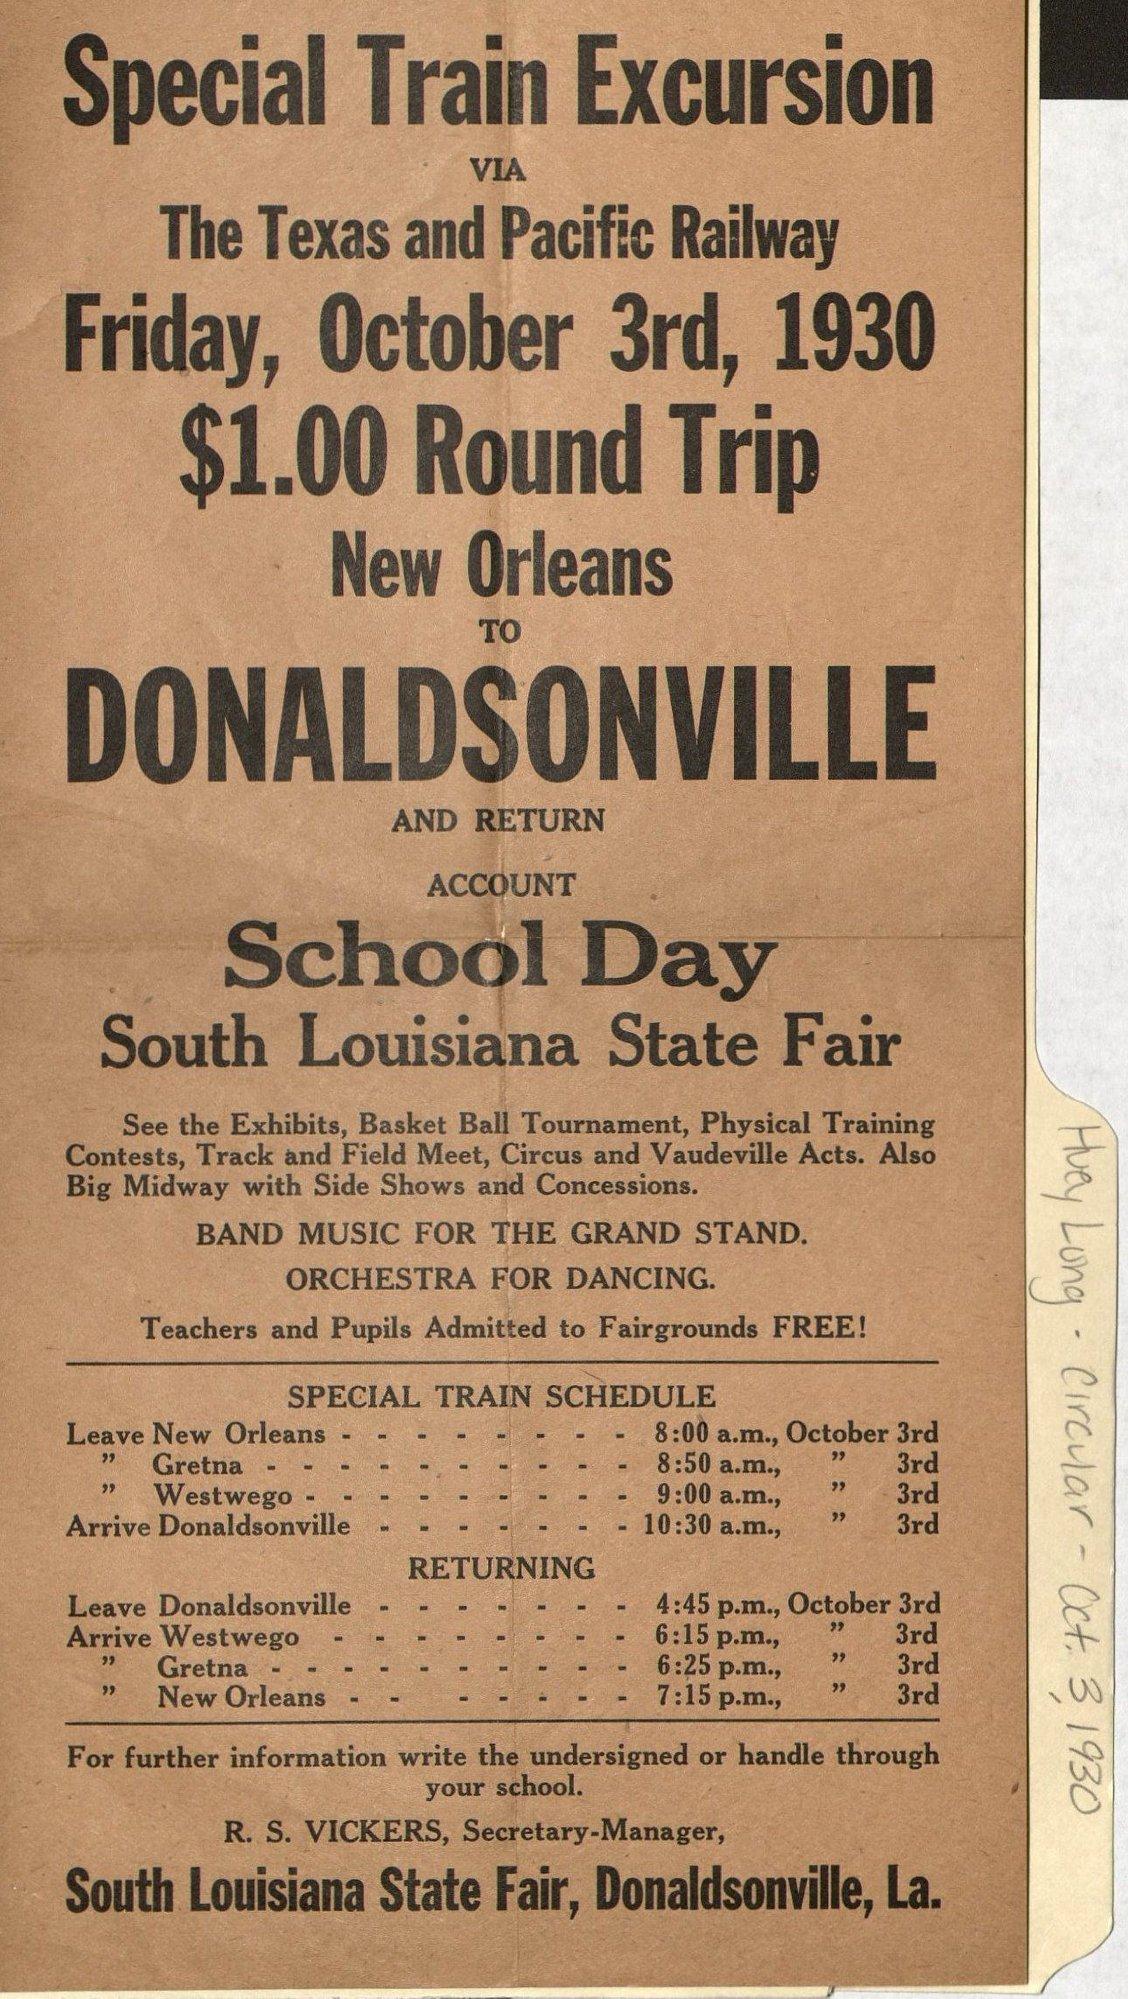 donaldsonville south louisiana state fair